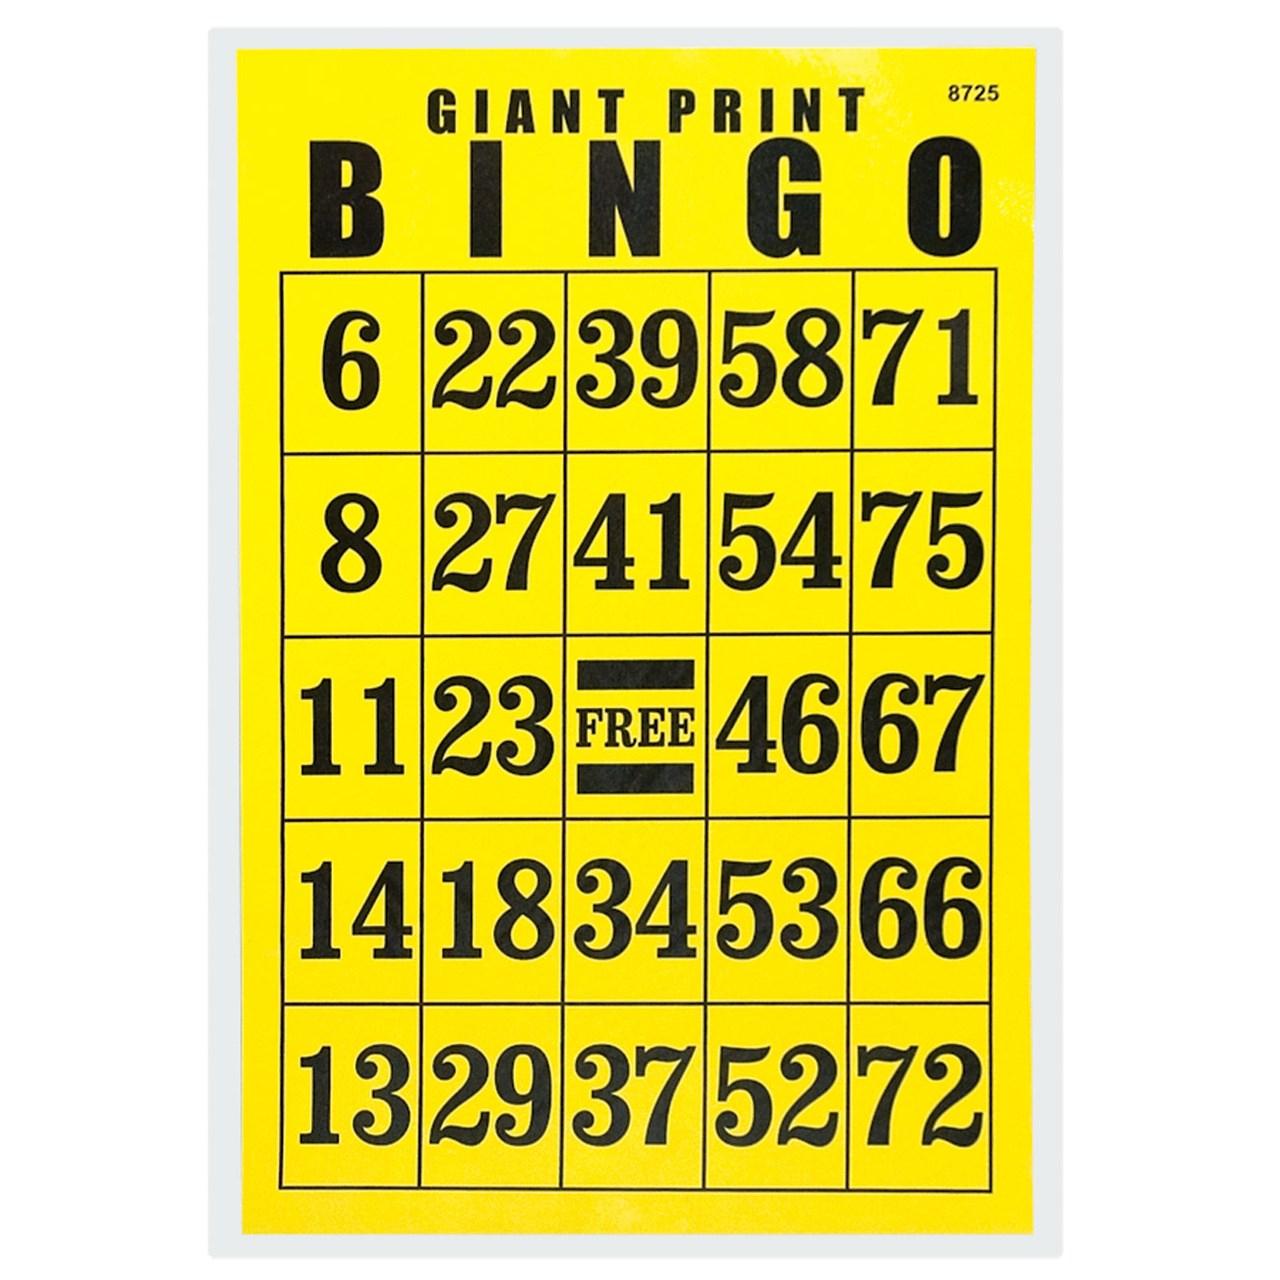 Giant Print Bingo Card - Black On Yellow Background